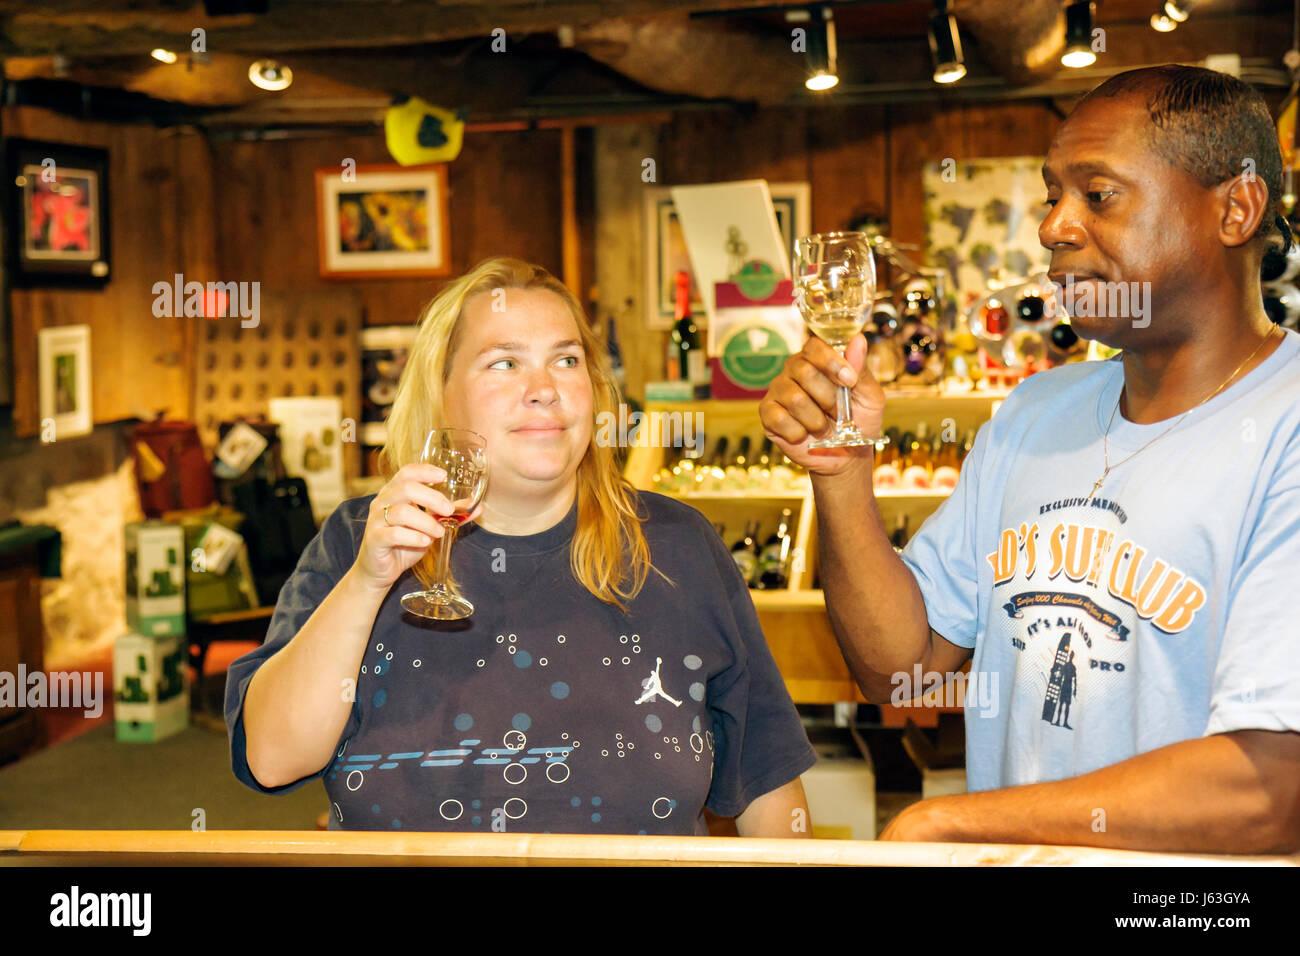 Michigan Grand Rapids Robinette Cellars wine tasting bar Black man woman couple wine sensory experience bouquet swirl white tast  sc 1 st  Alamy & Michigan Grand Rapids Robinette Cellars wine tasting bar Black man ...